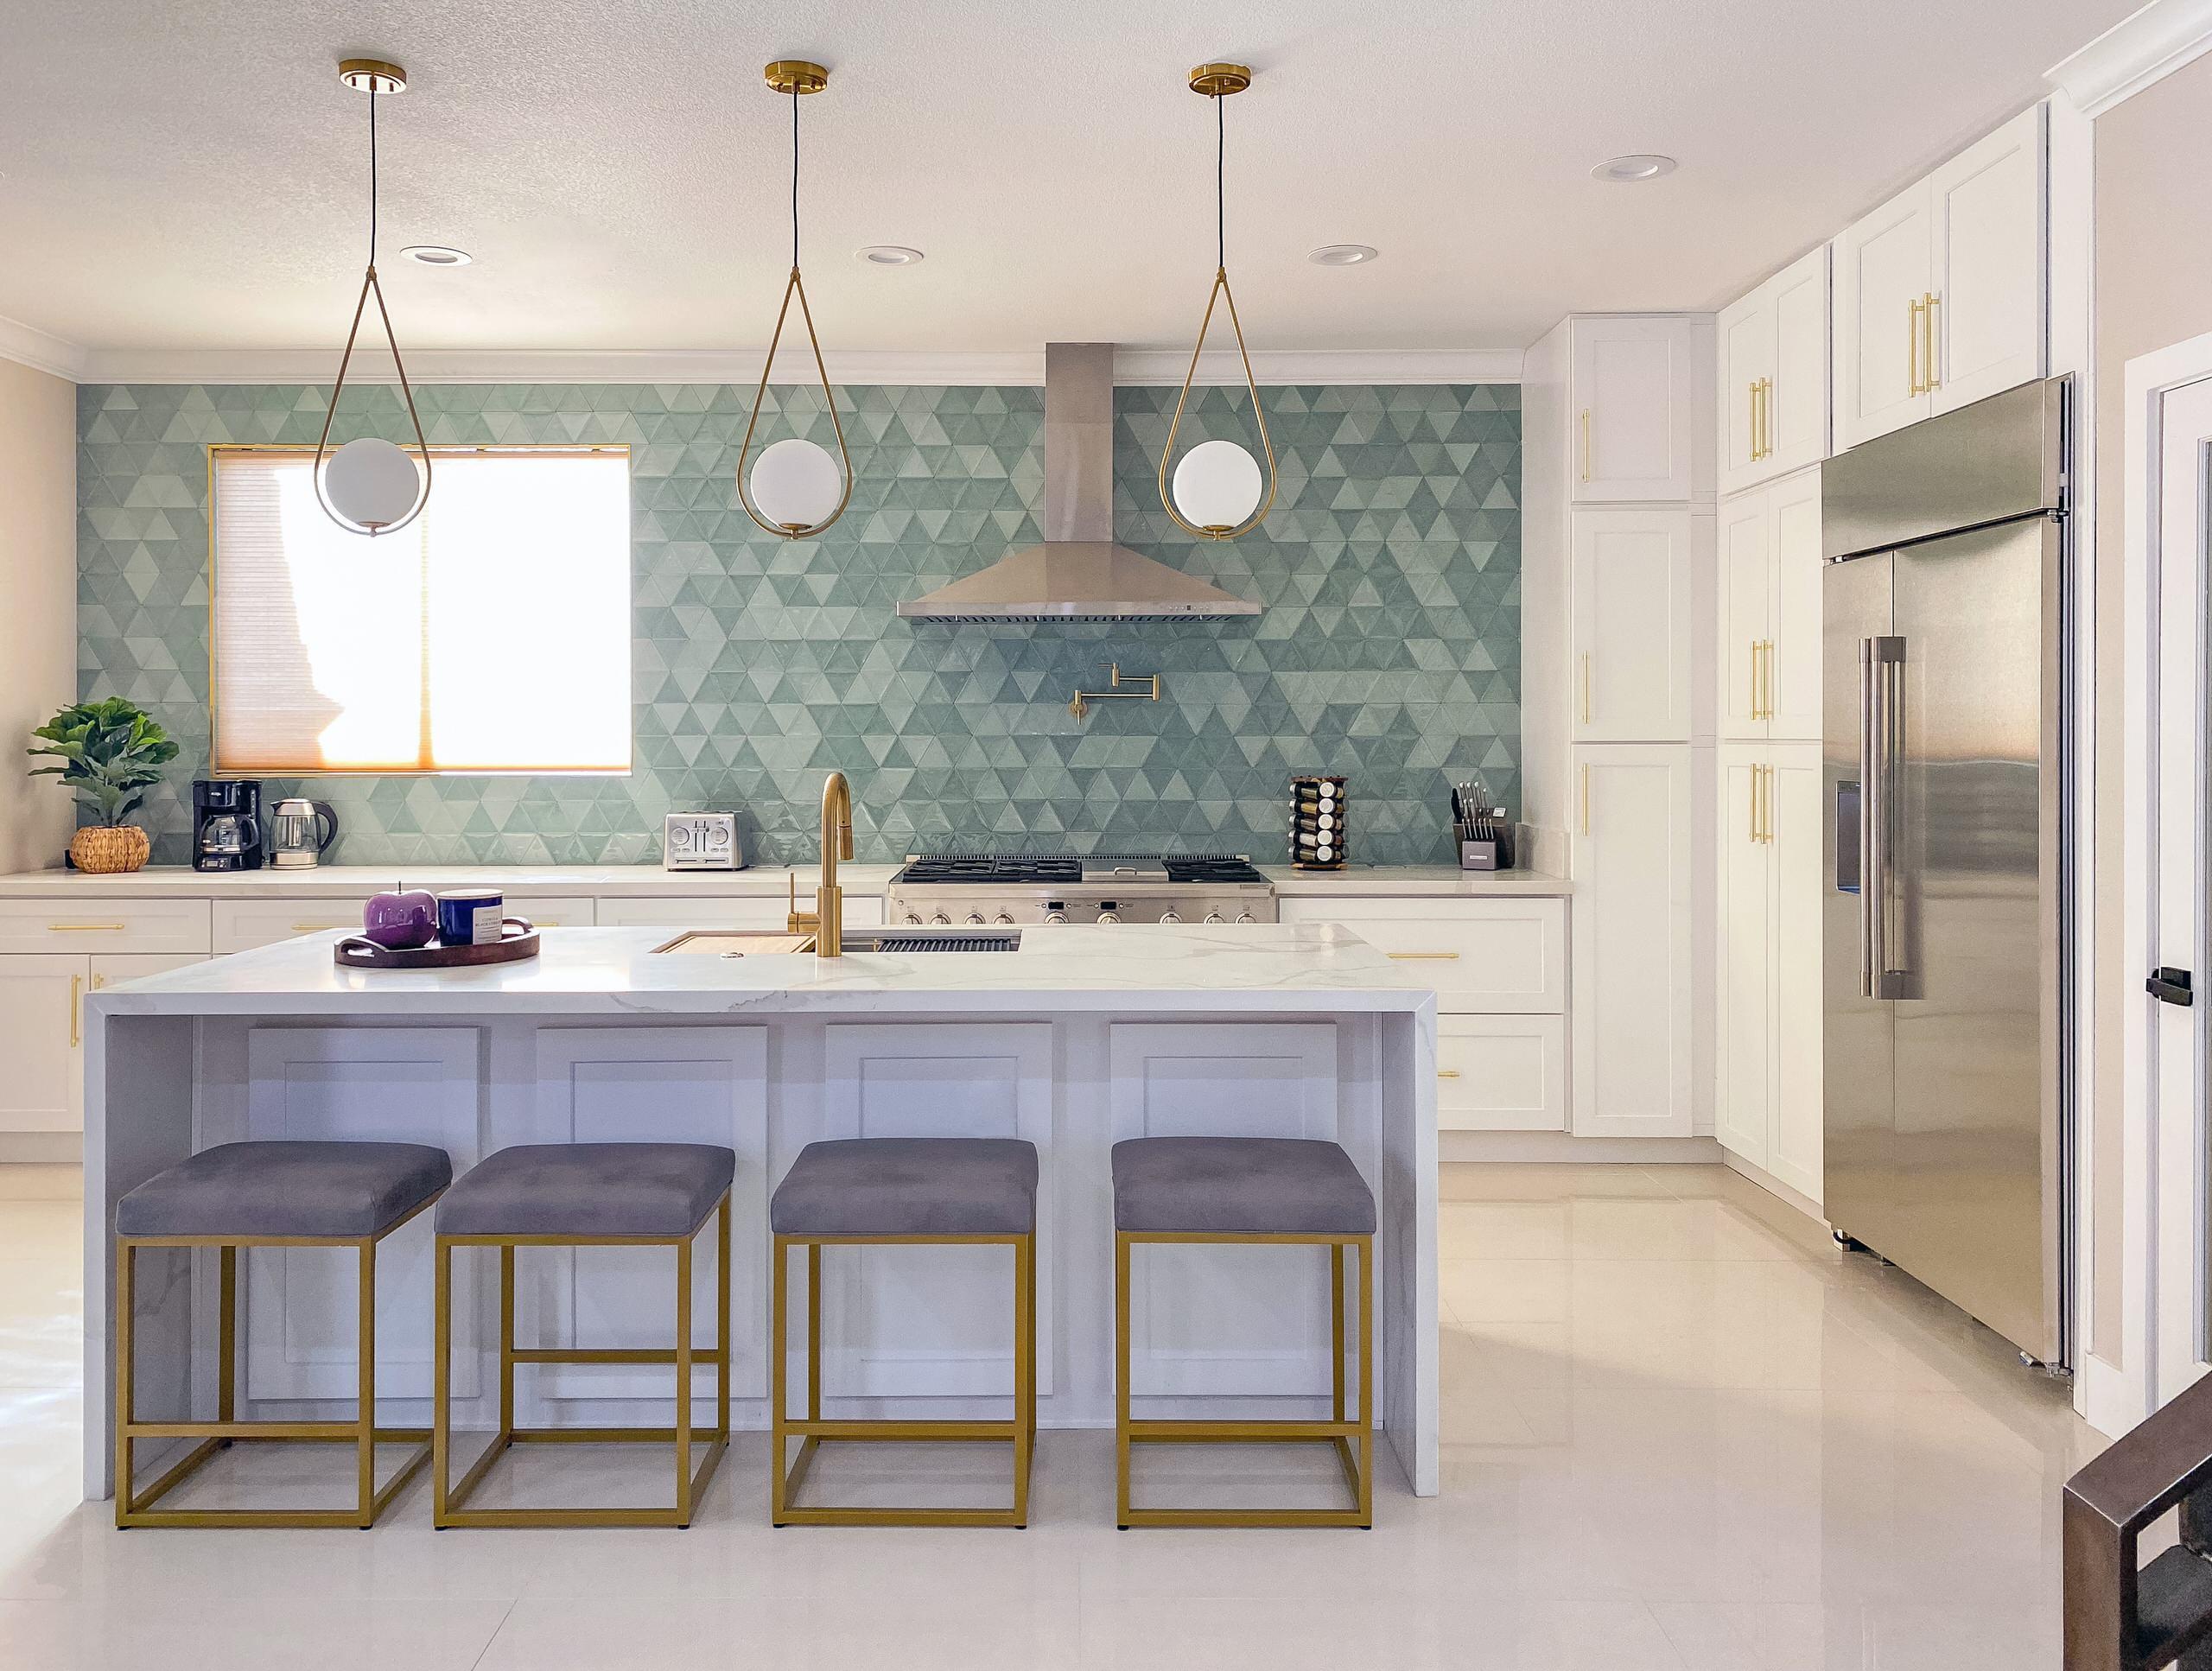 2021 Henderson Airbnb Renovation